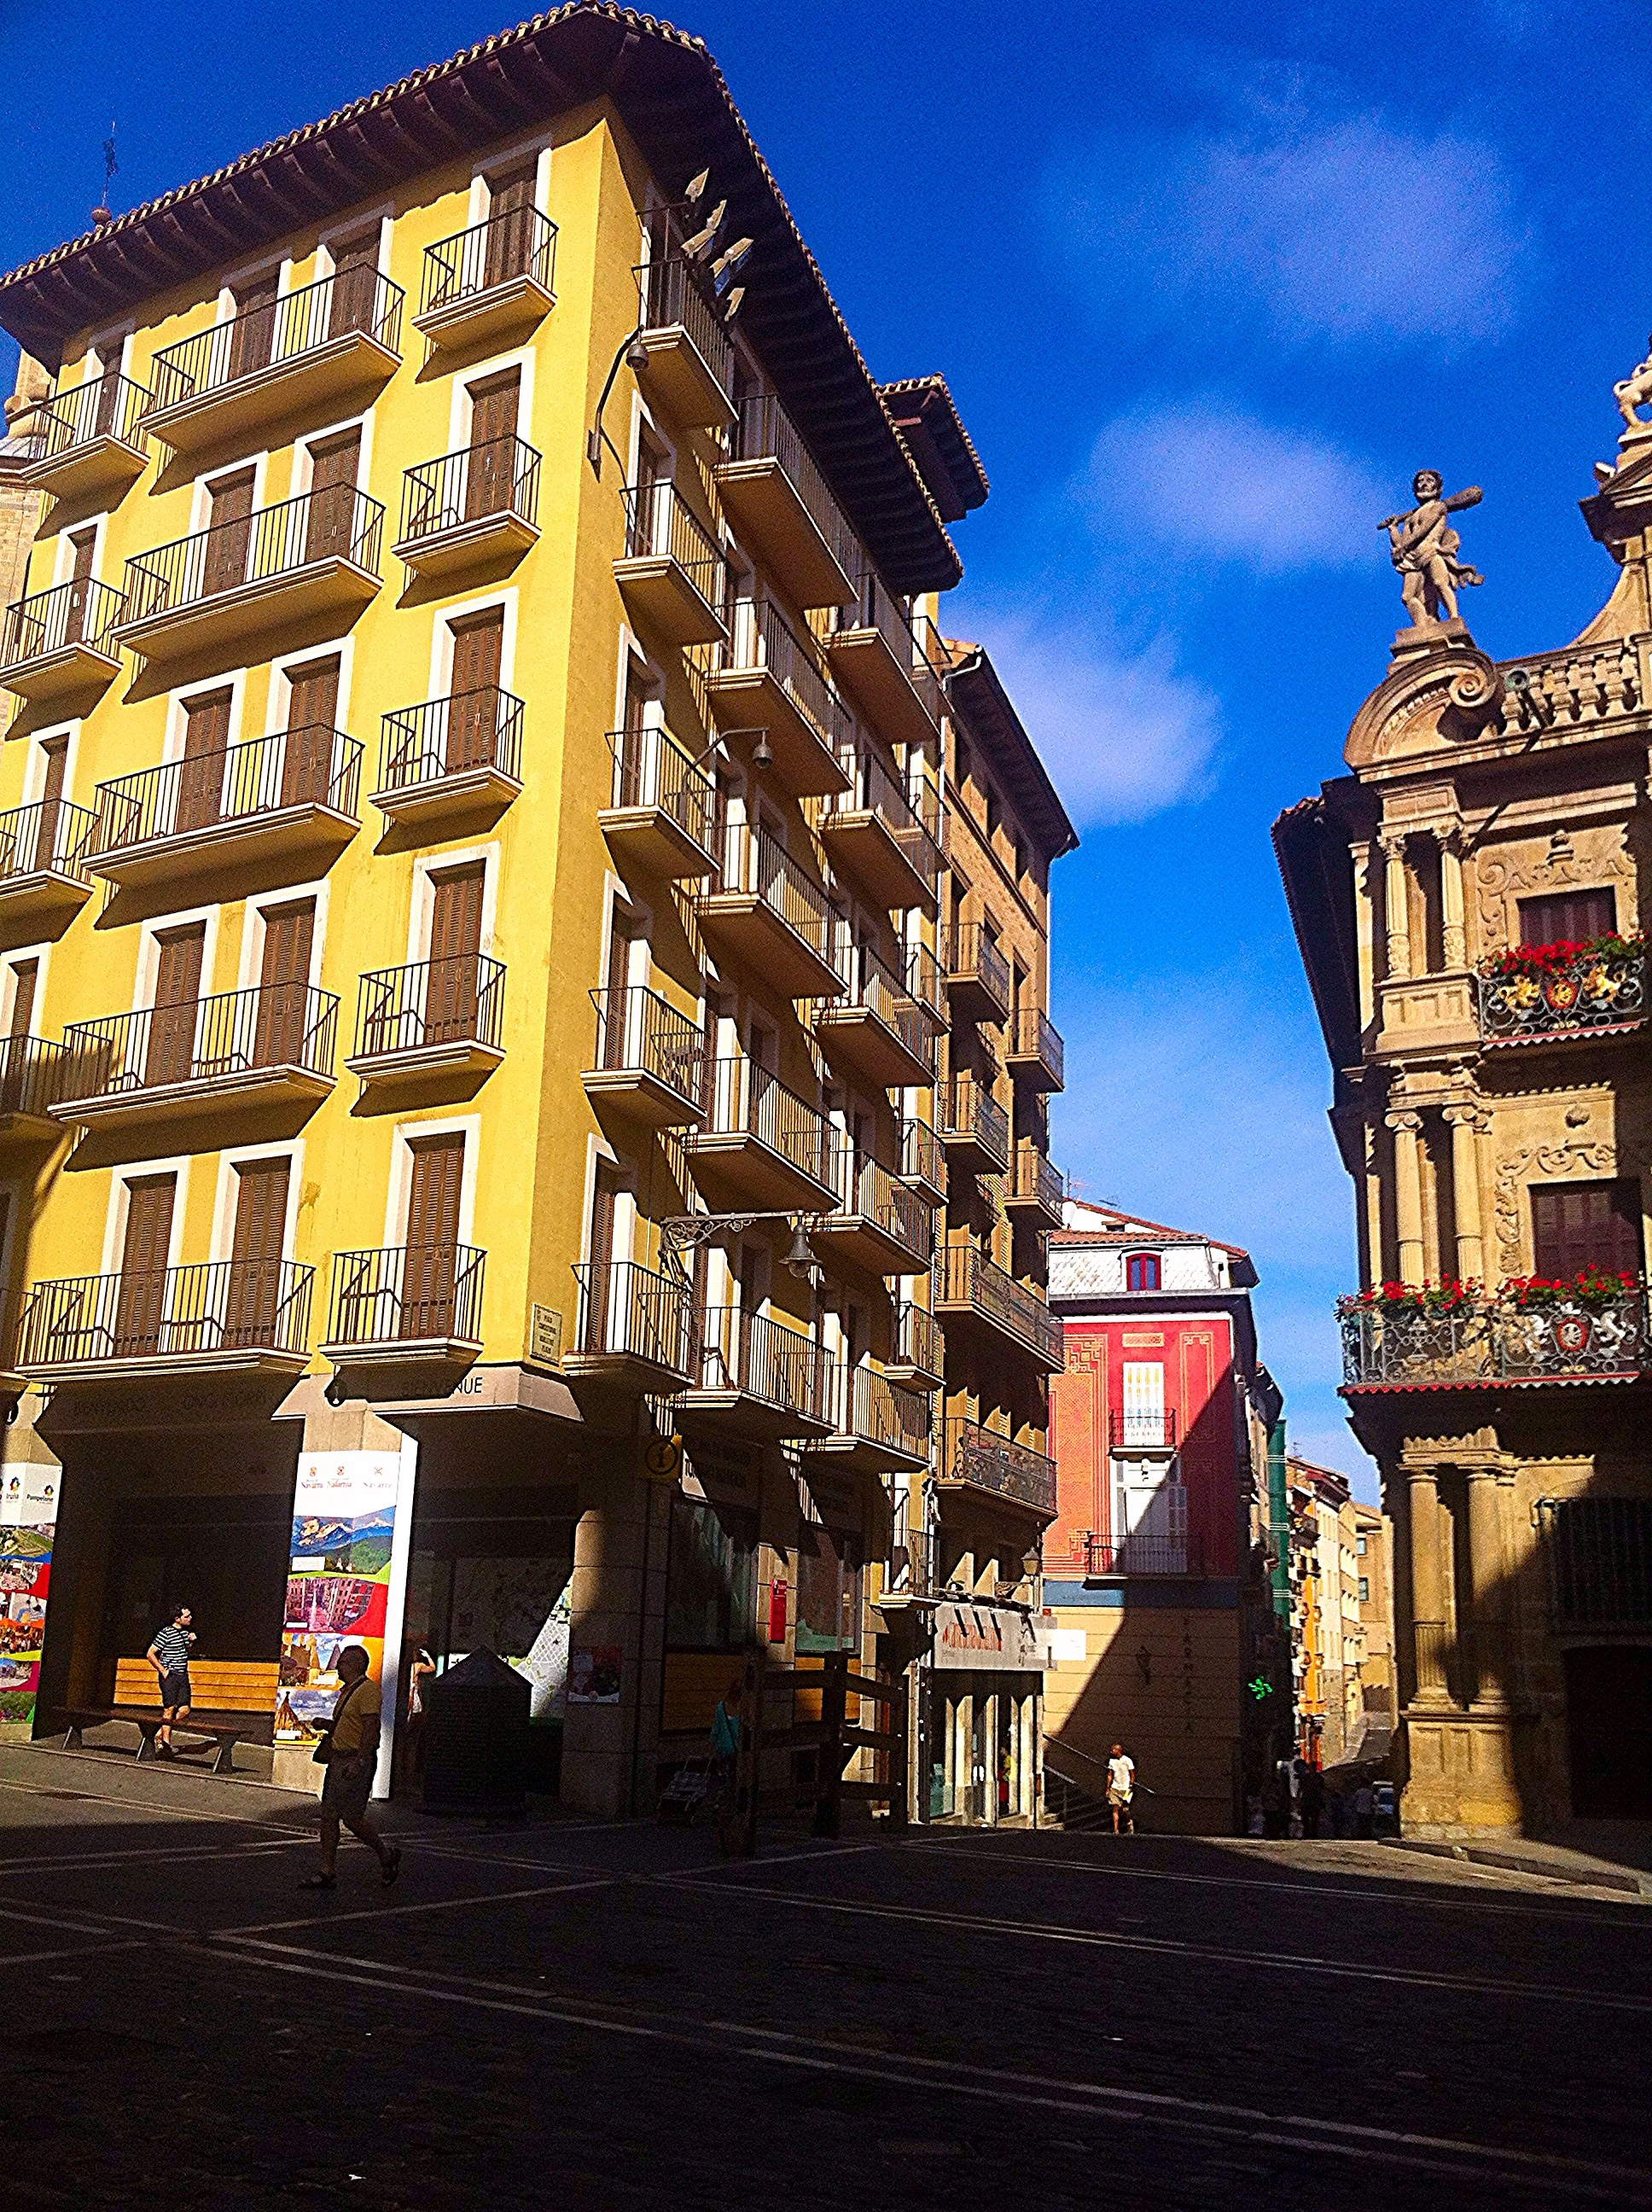 Strolling through Pamplona